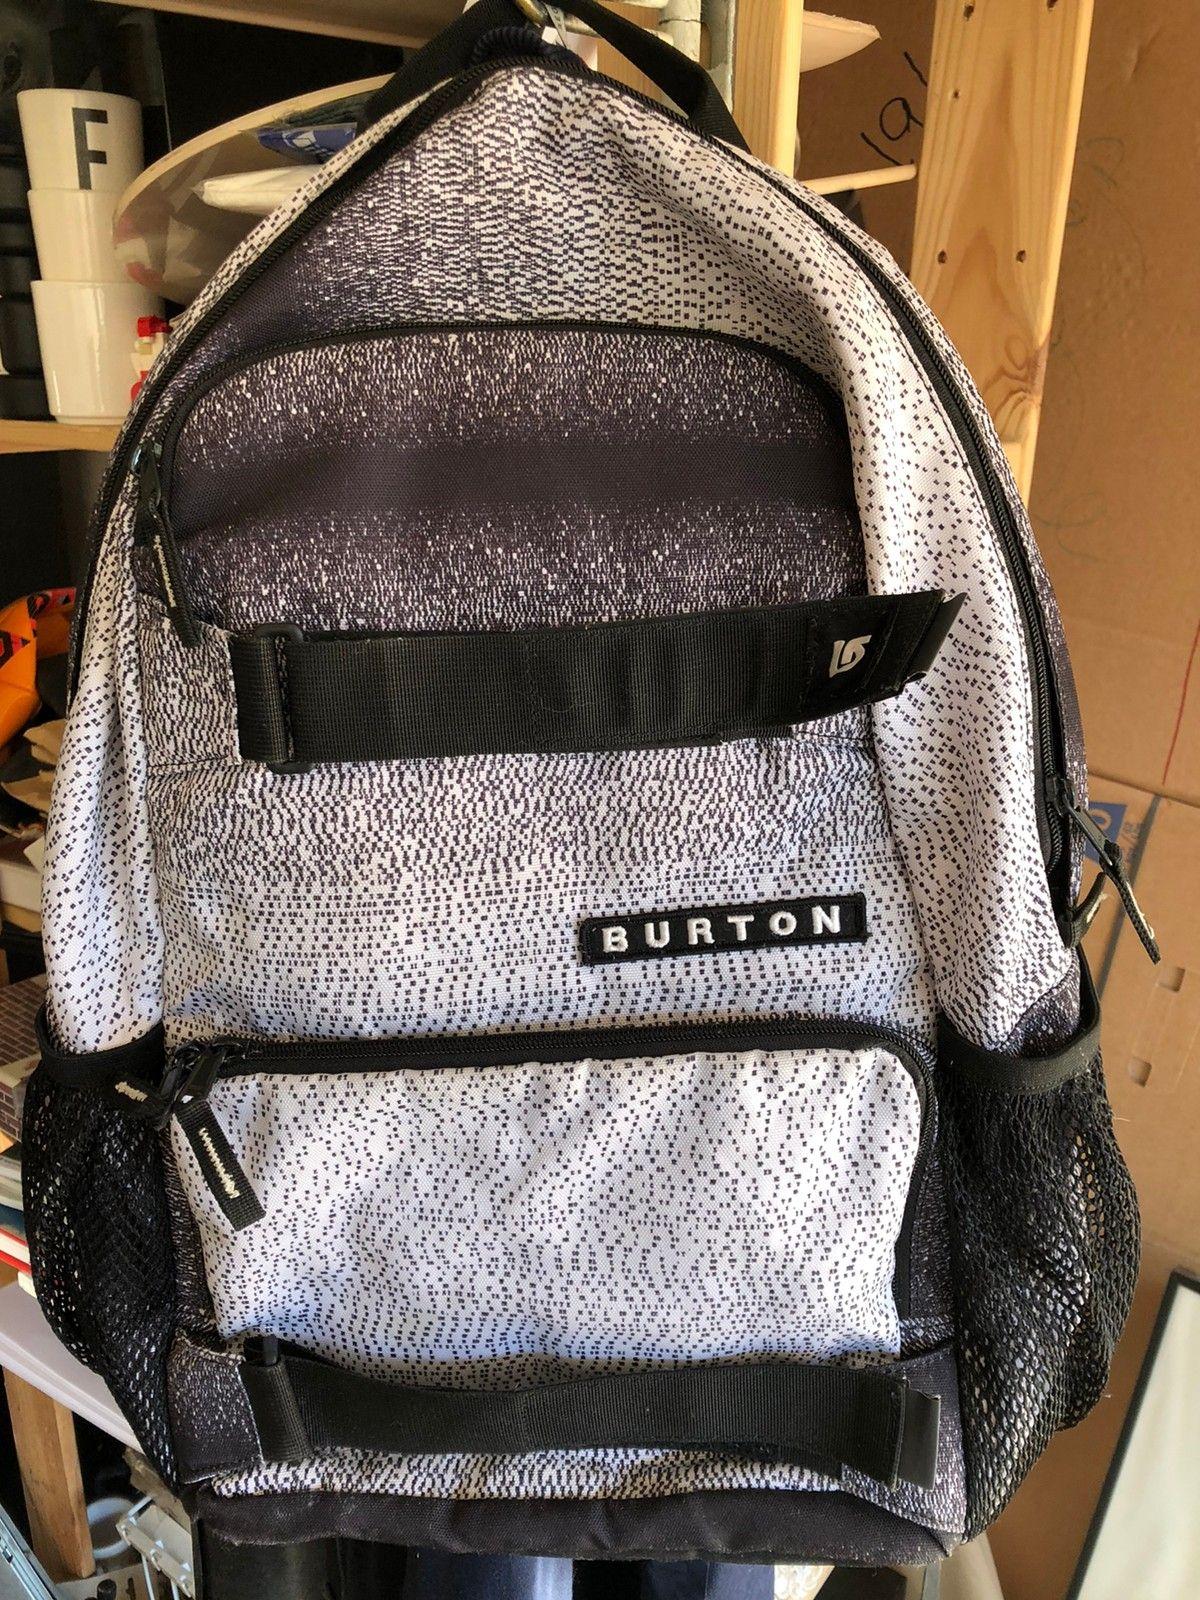 Burton sekk | FINN.no